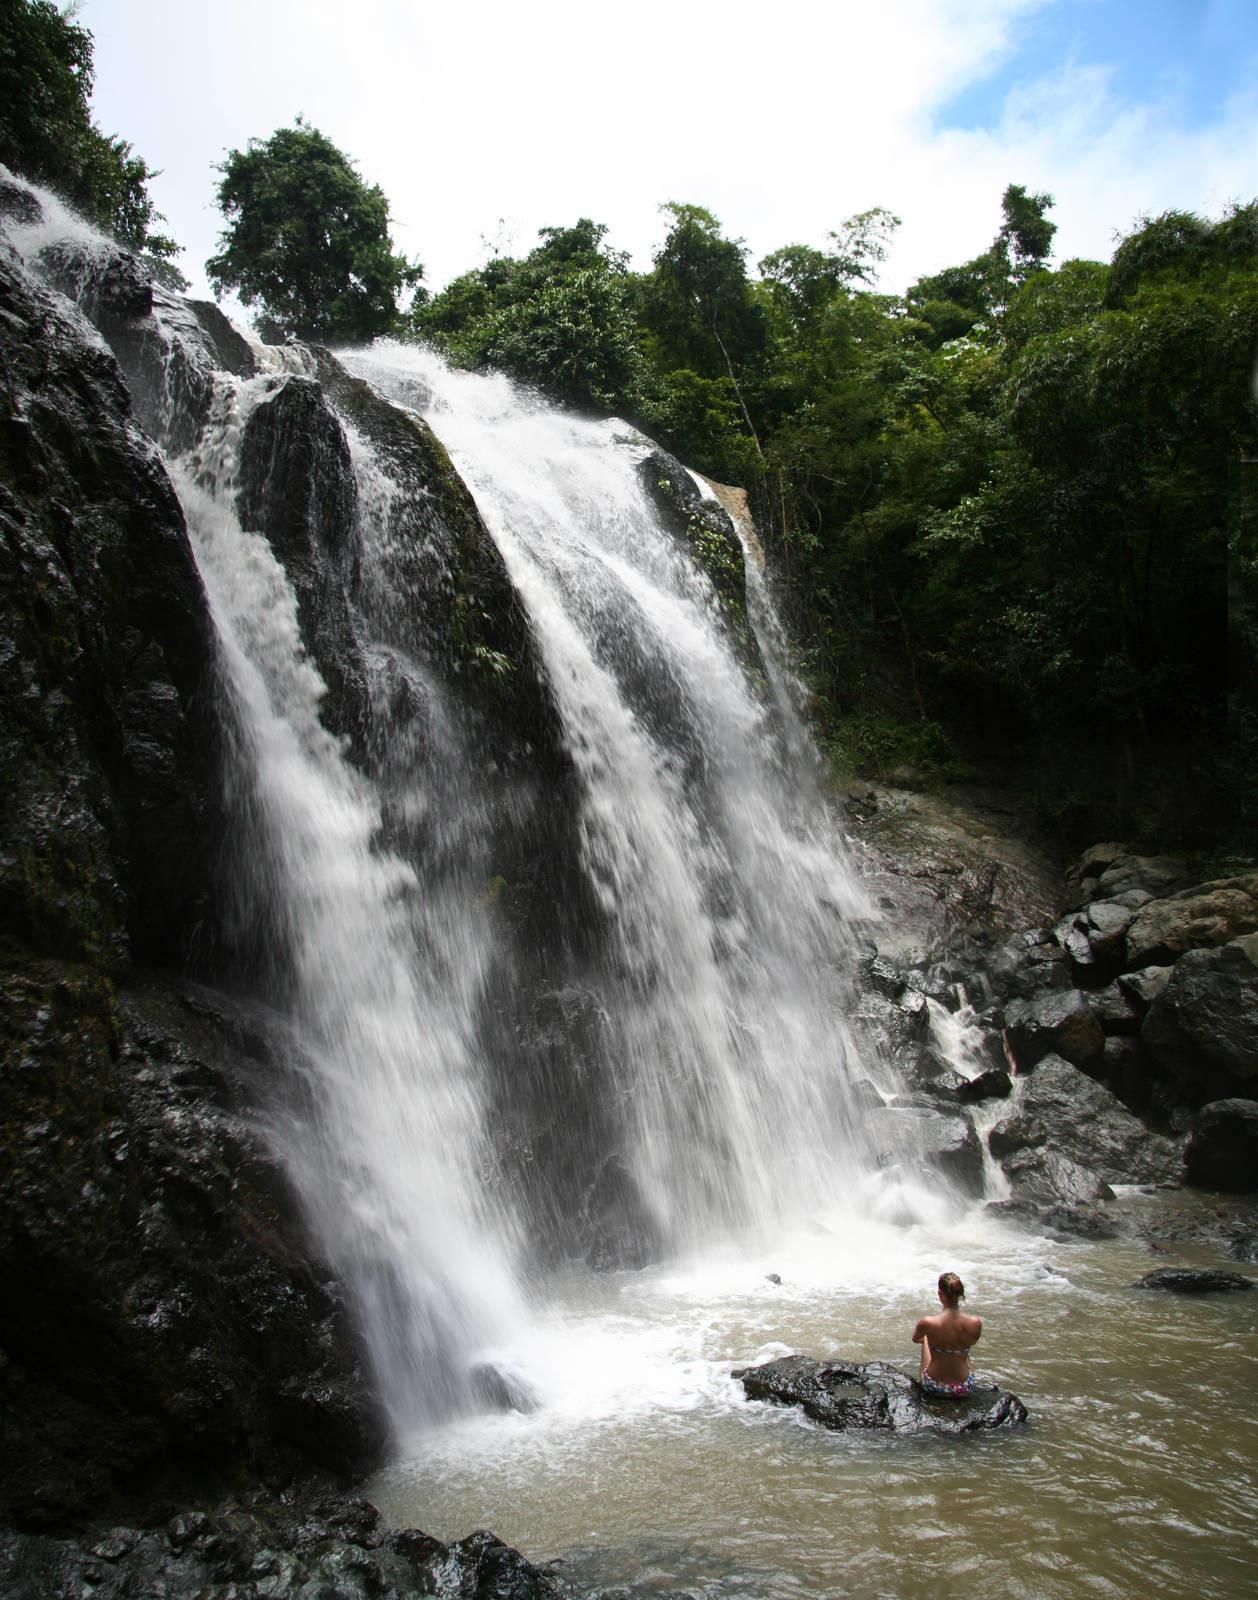 Argyle Waterfall - the tallest in Tobago